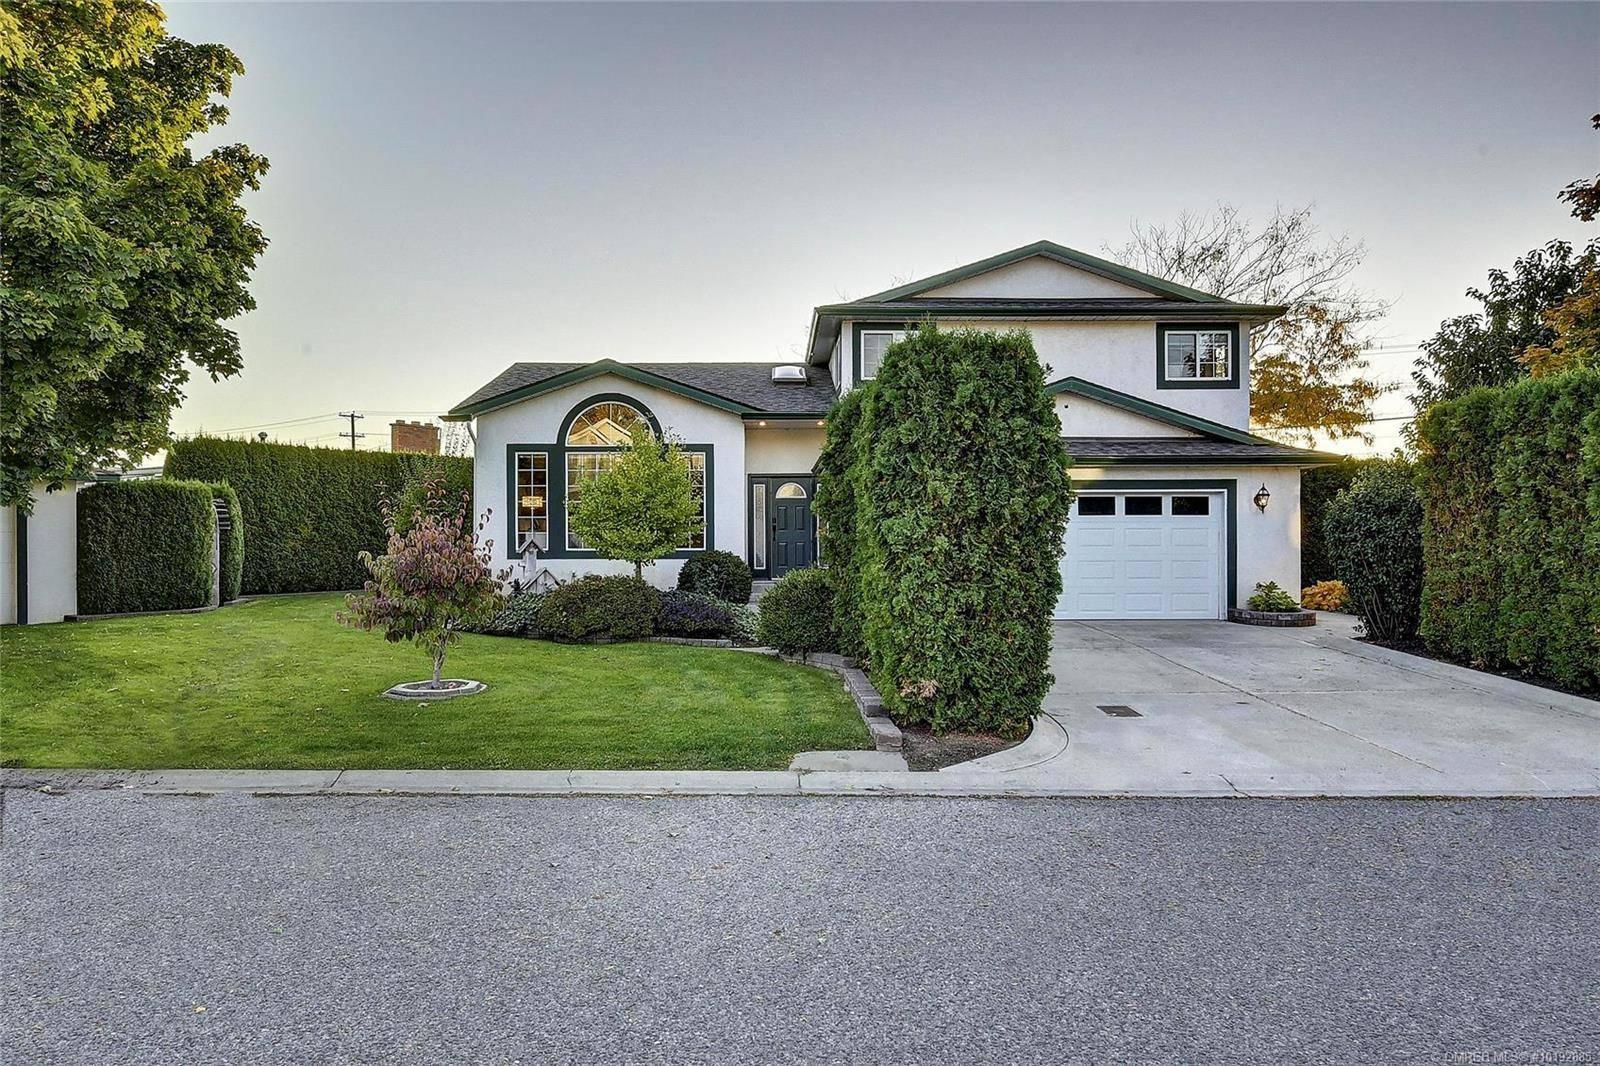 House for sale at 430 Hollywood Ct Kelowna British Columbia - MLS: 10192885